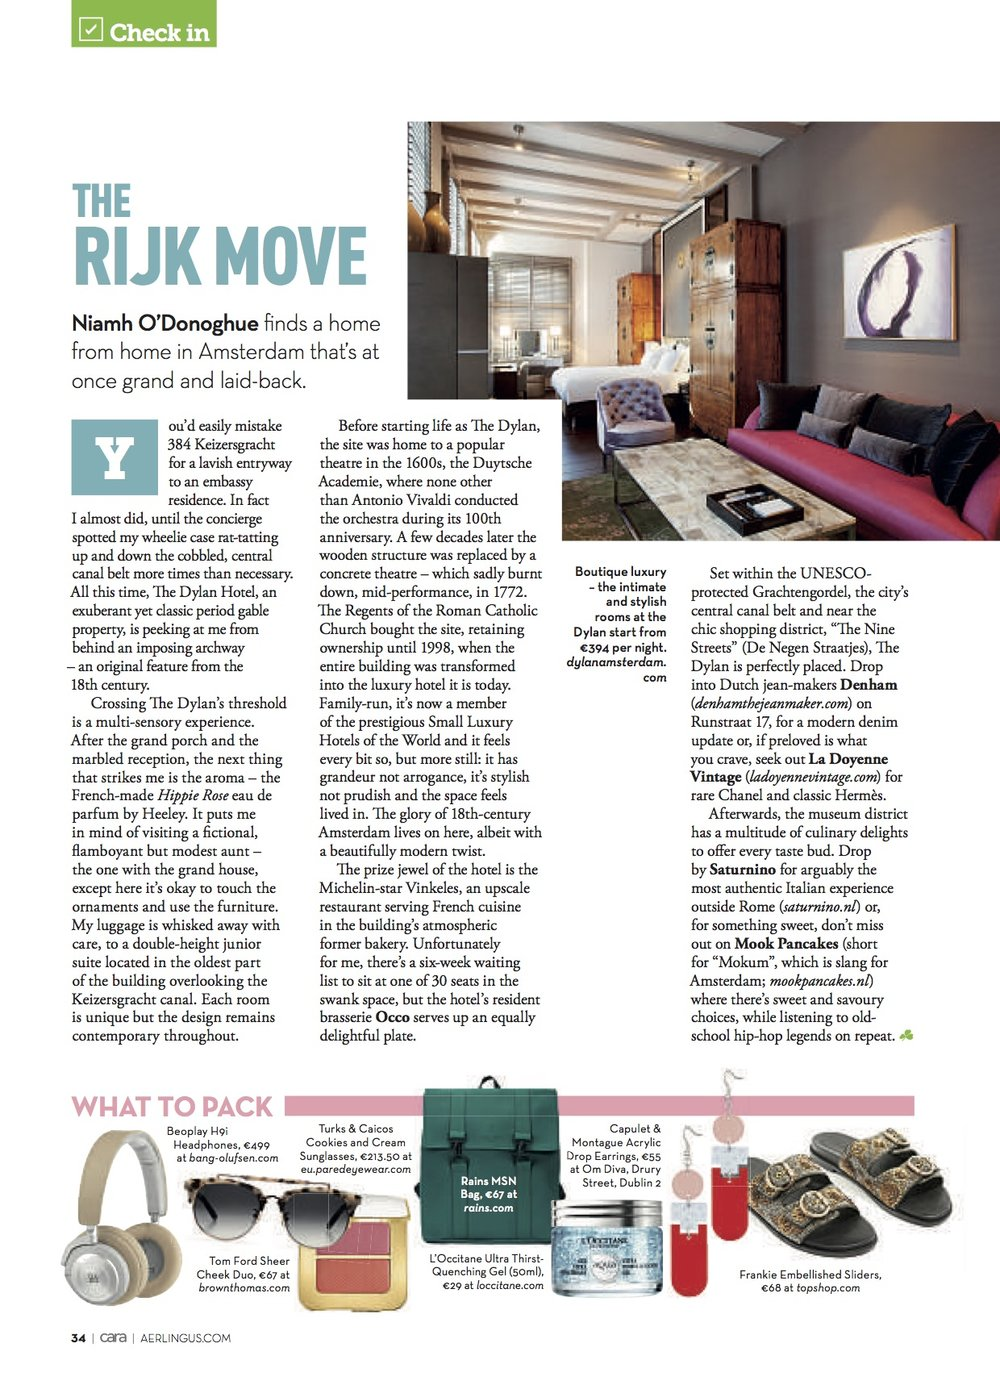 Luxury Amsterdam in the June 2018 issue of CARA in-flight Magazine on Aerlingus